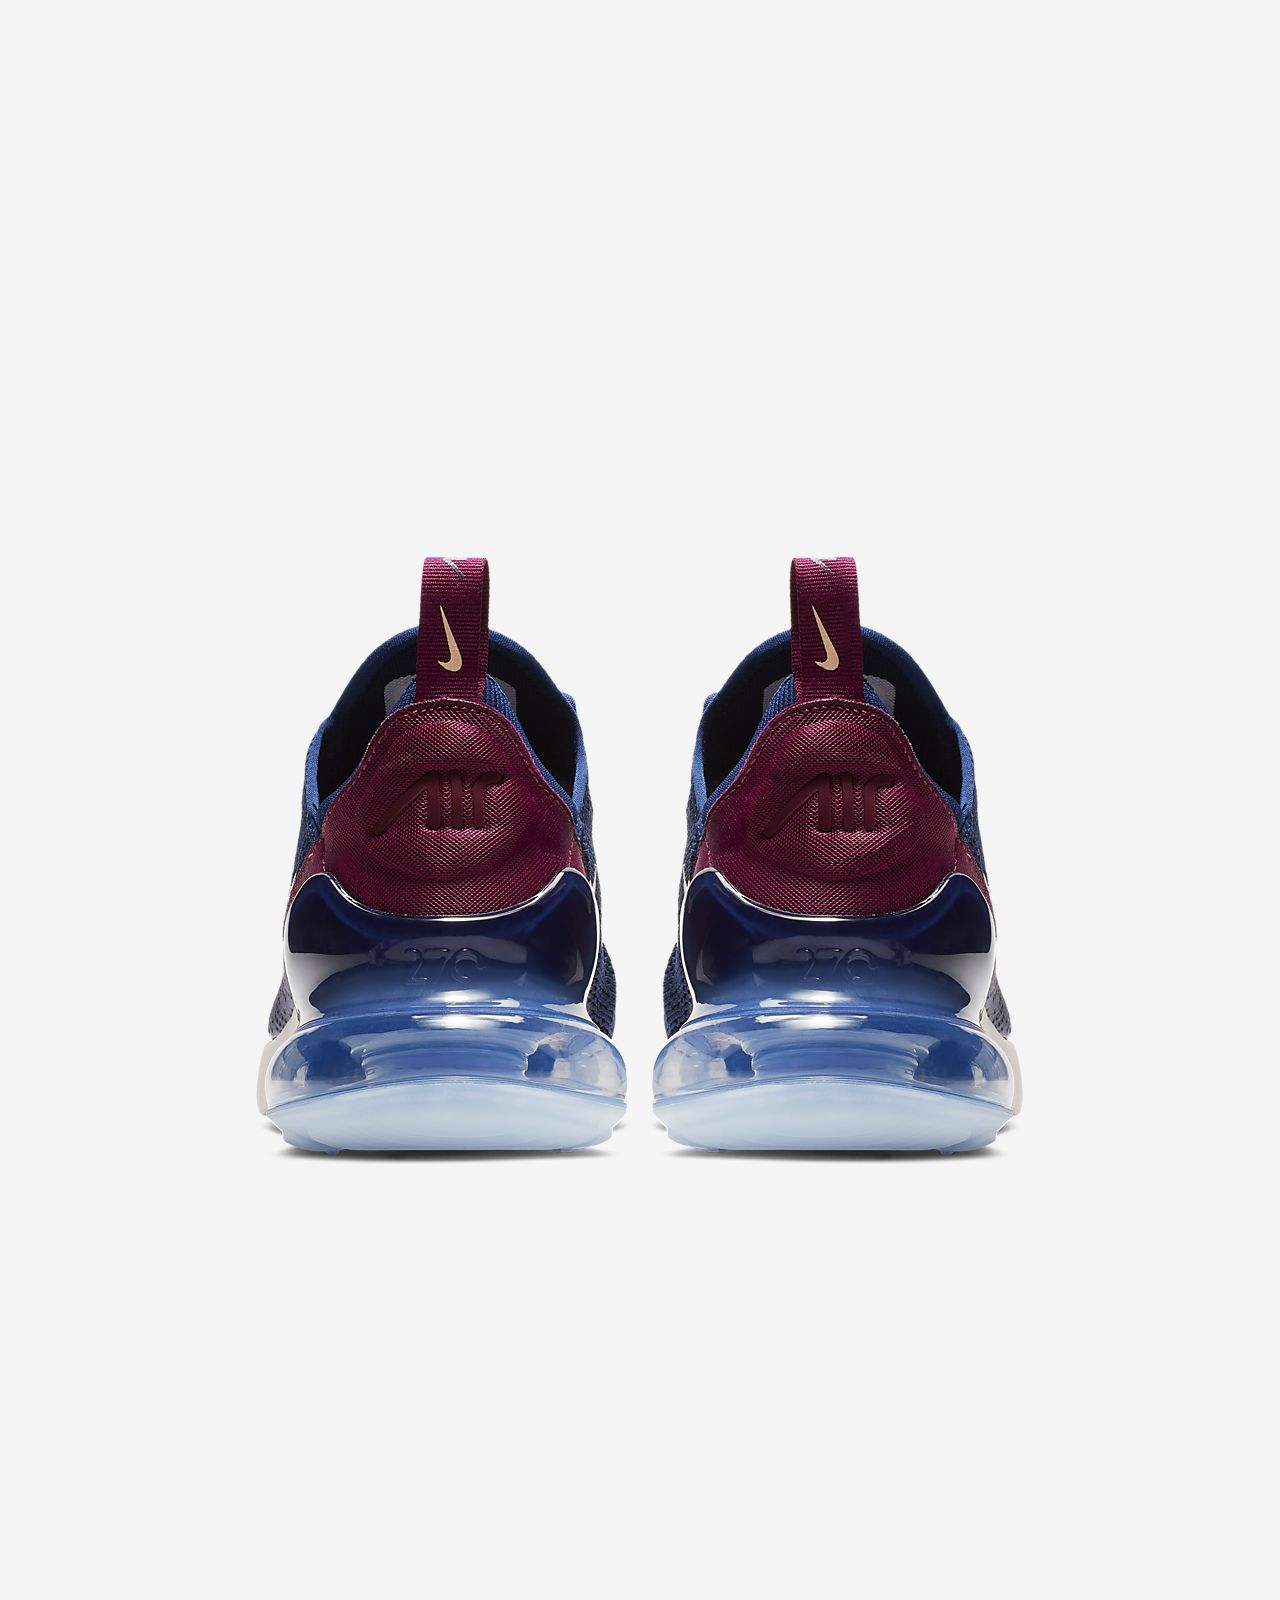 7e1f61b372 Nike Air Max 270 Women's Shoe. Nike.com CH